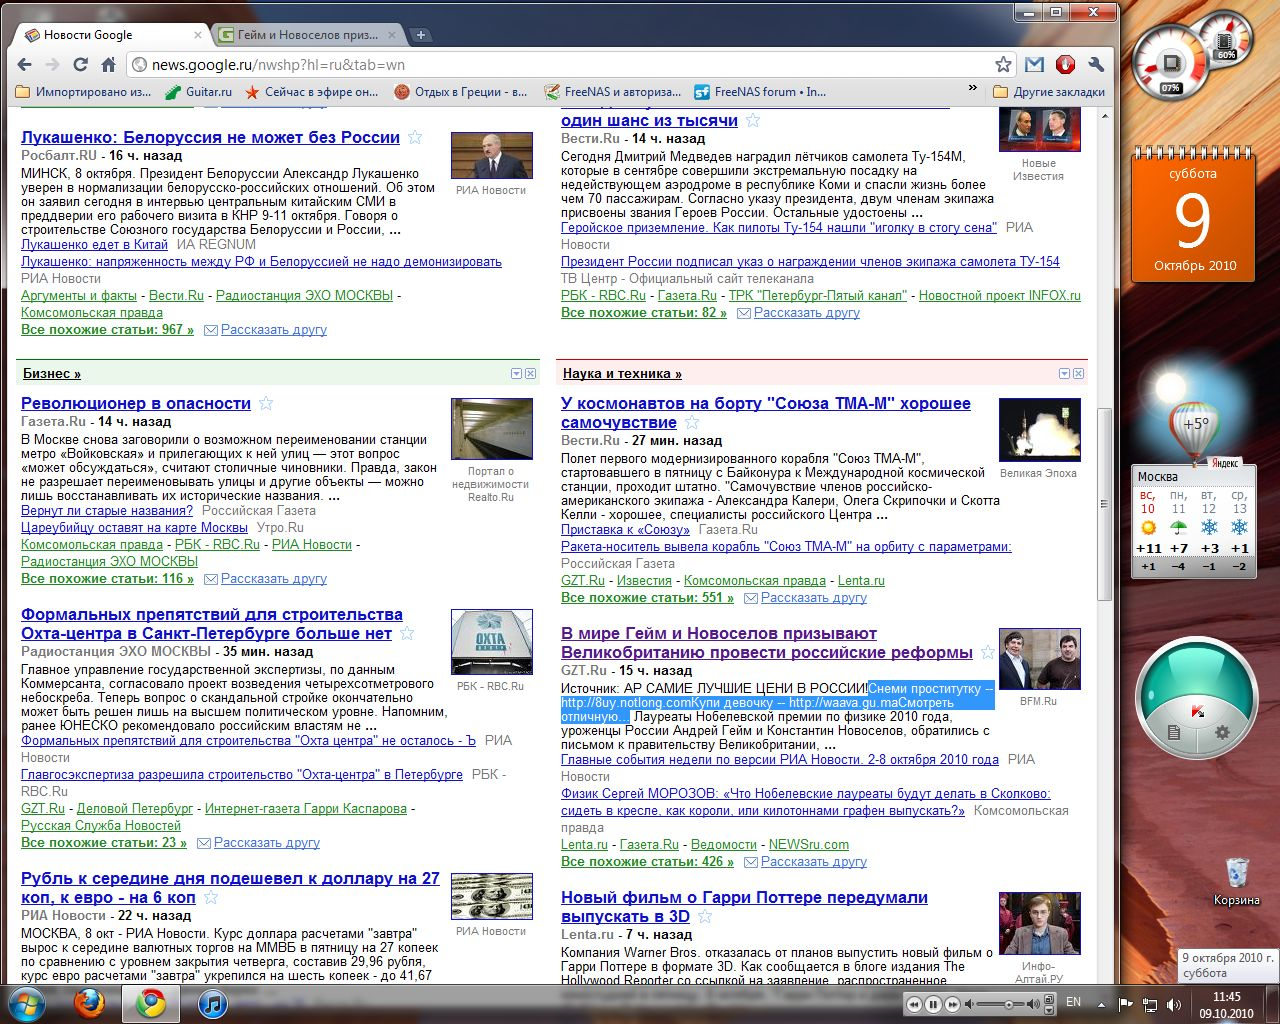 реклама в новостях гугл